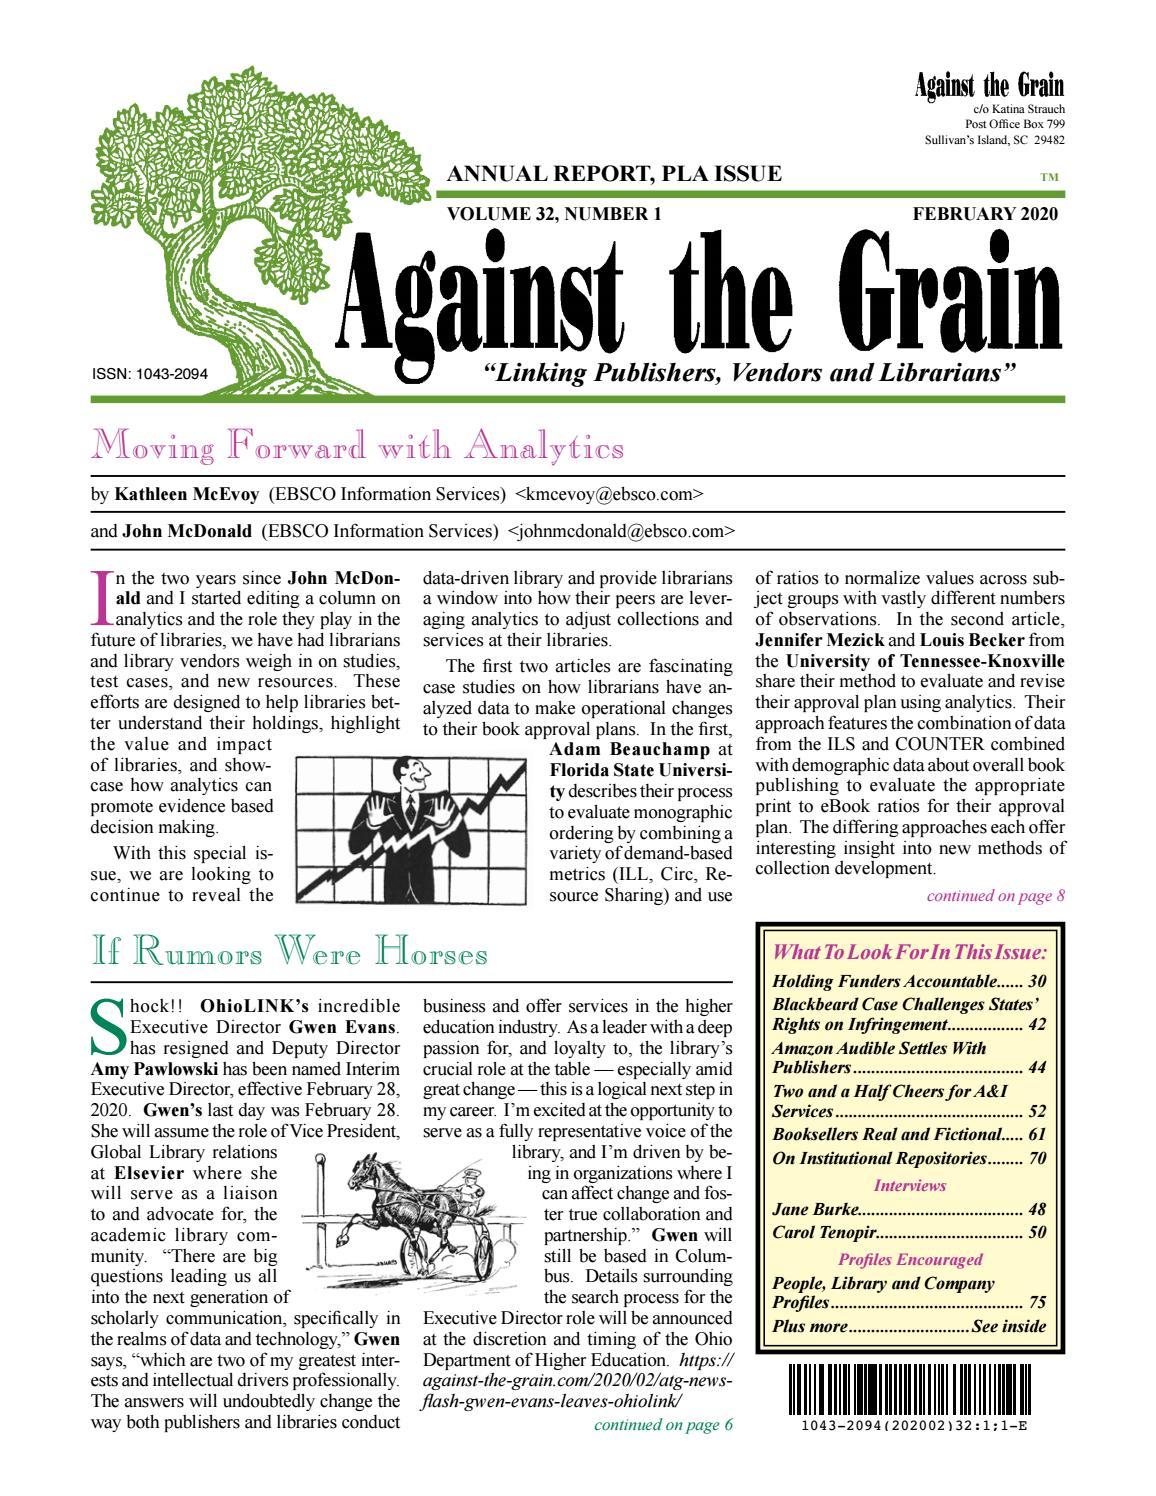 Against The Grain V32 #1 February 2020 For Wiliam & Mary 2021/2020 Calendar